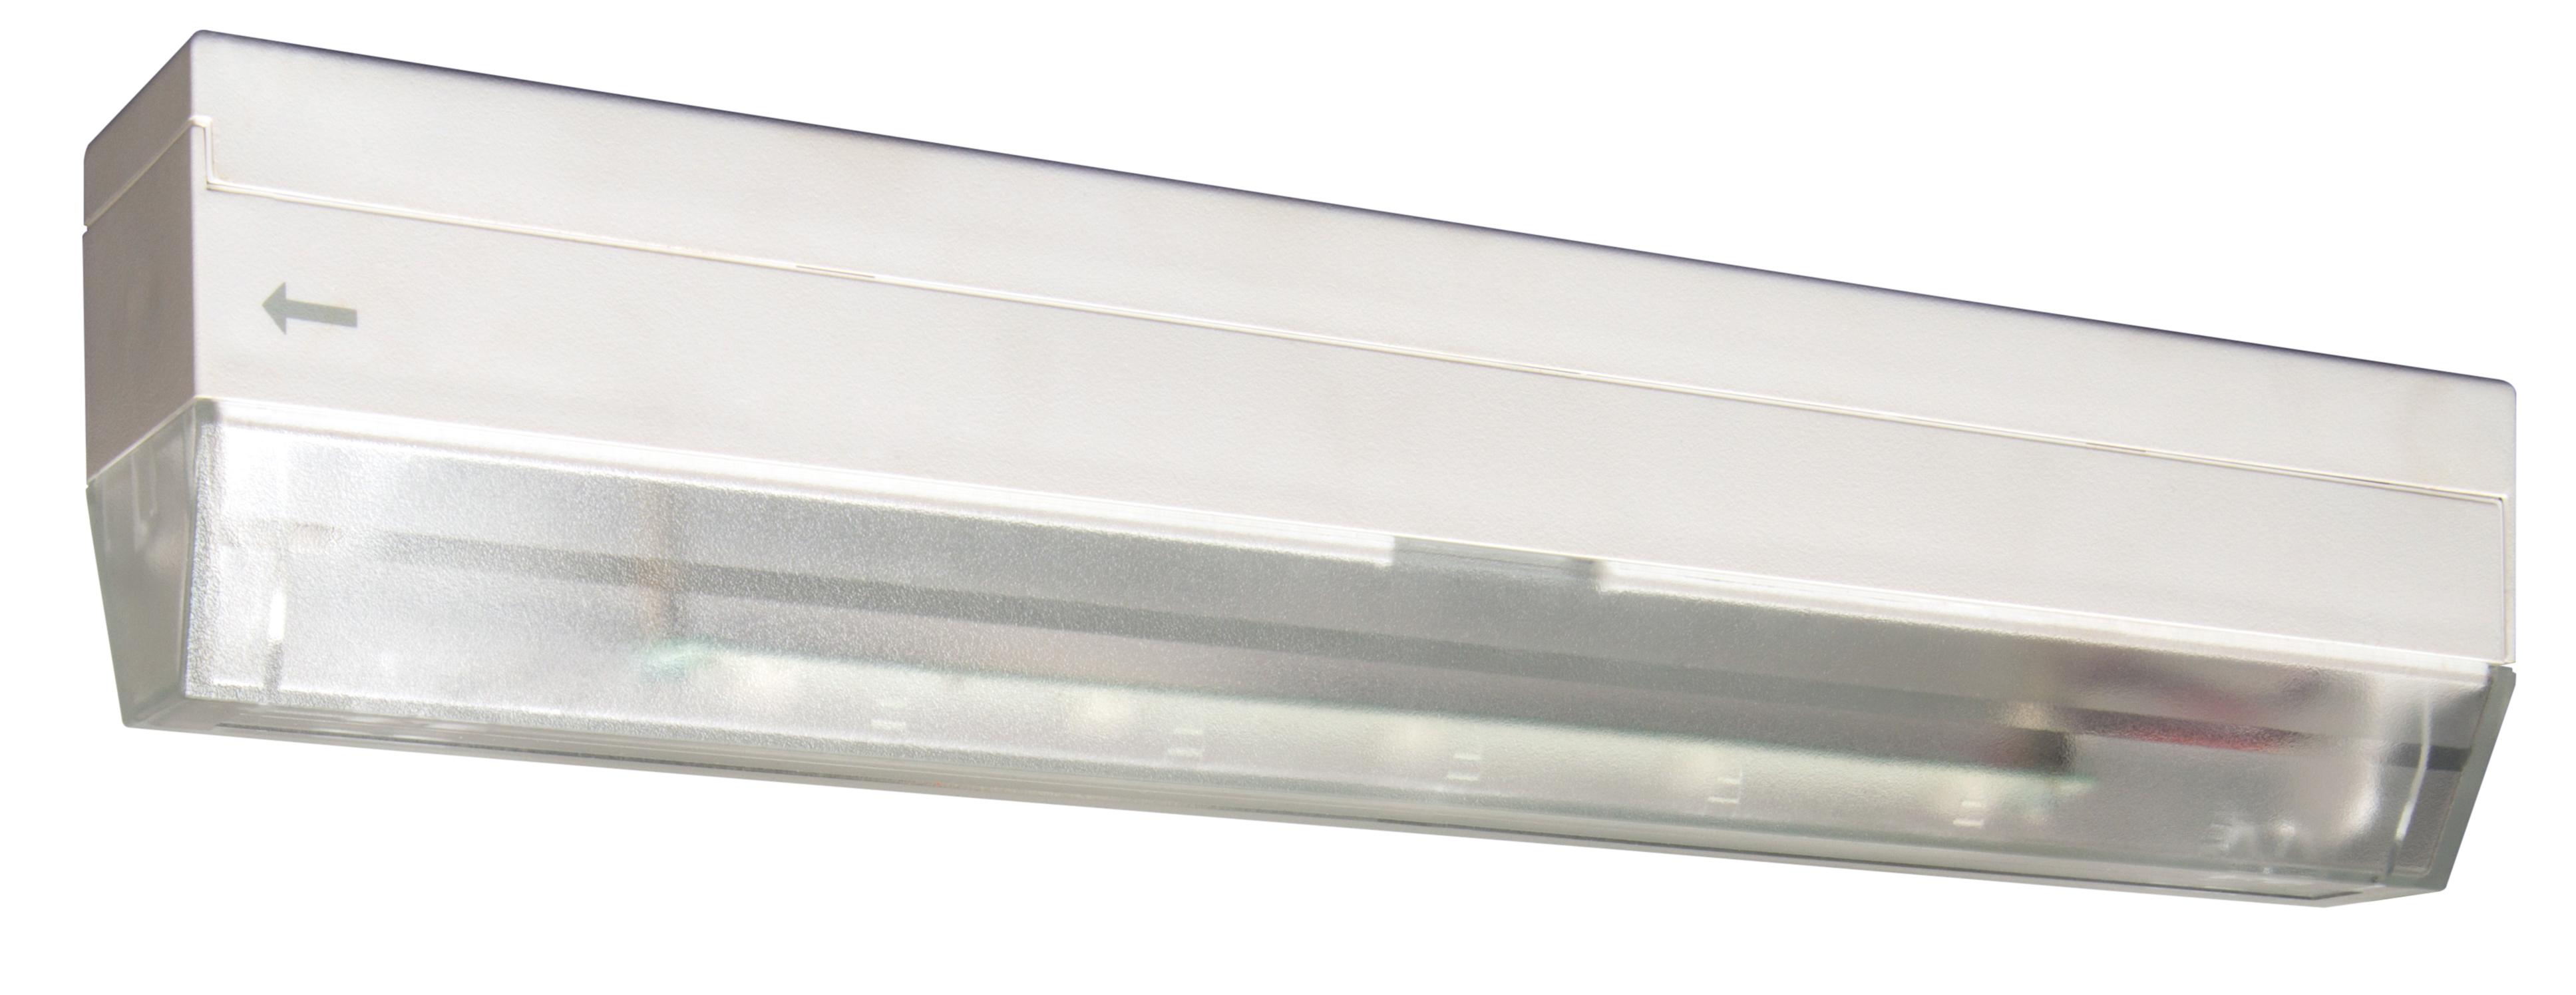 1 Stk Notleuchte KE Wireless LED 3h 230VAC Universalmontage NLKEU003WL